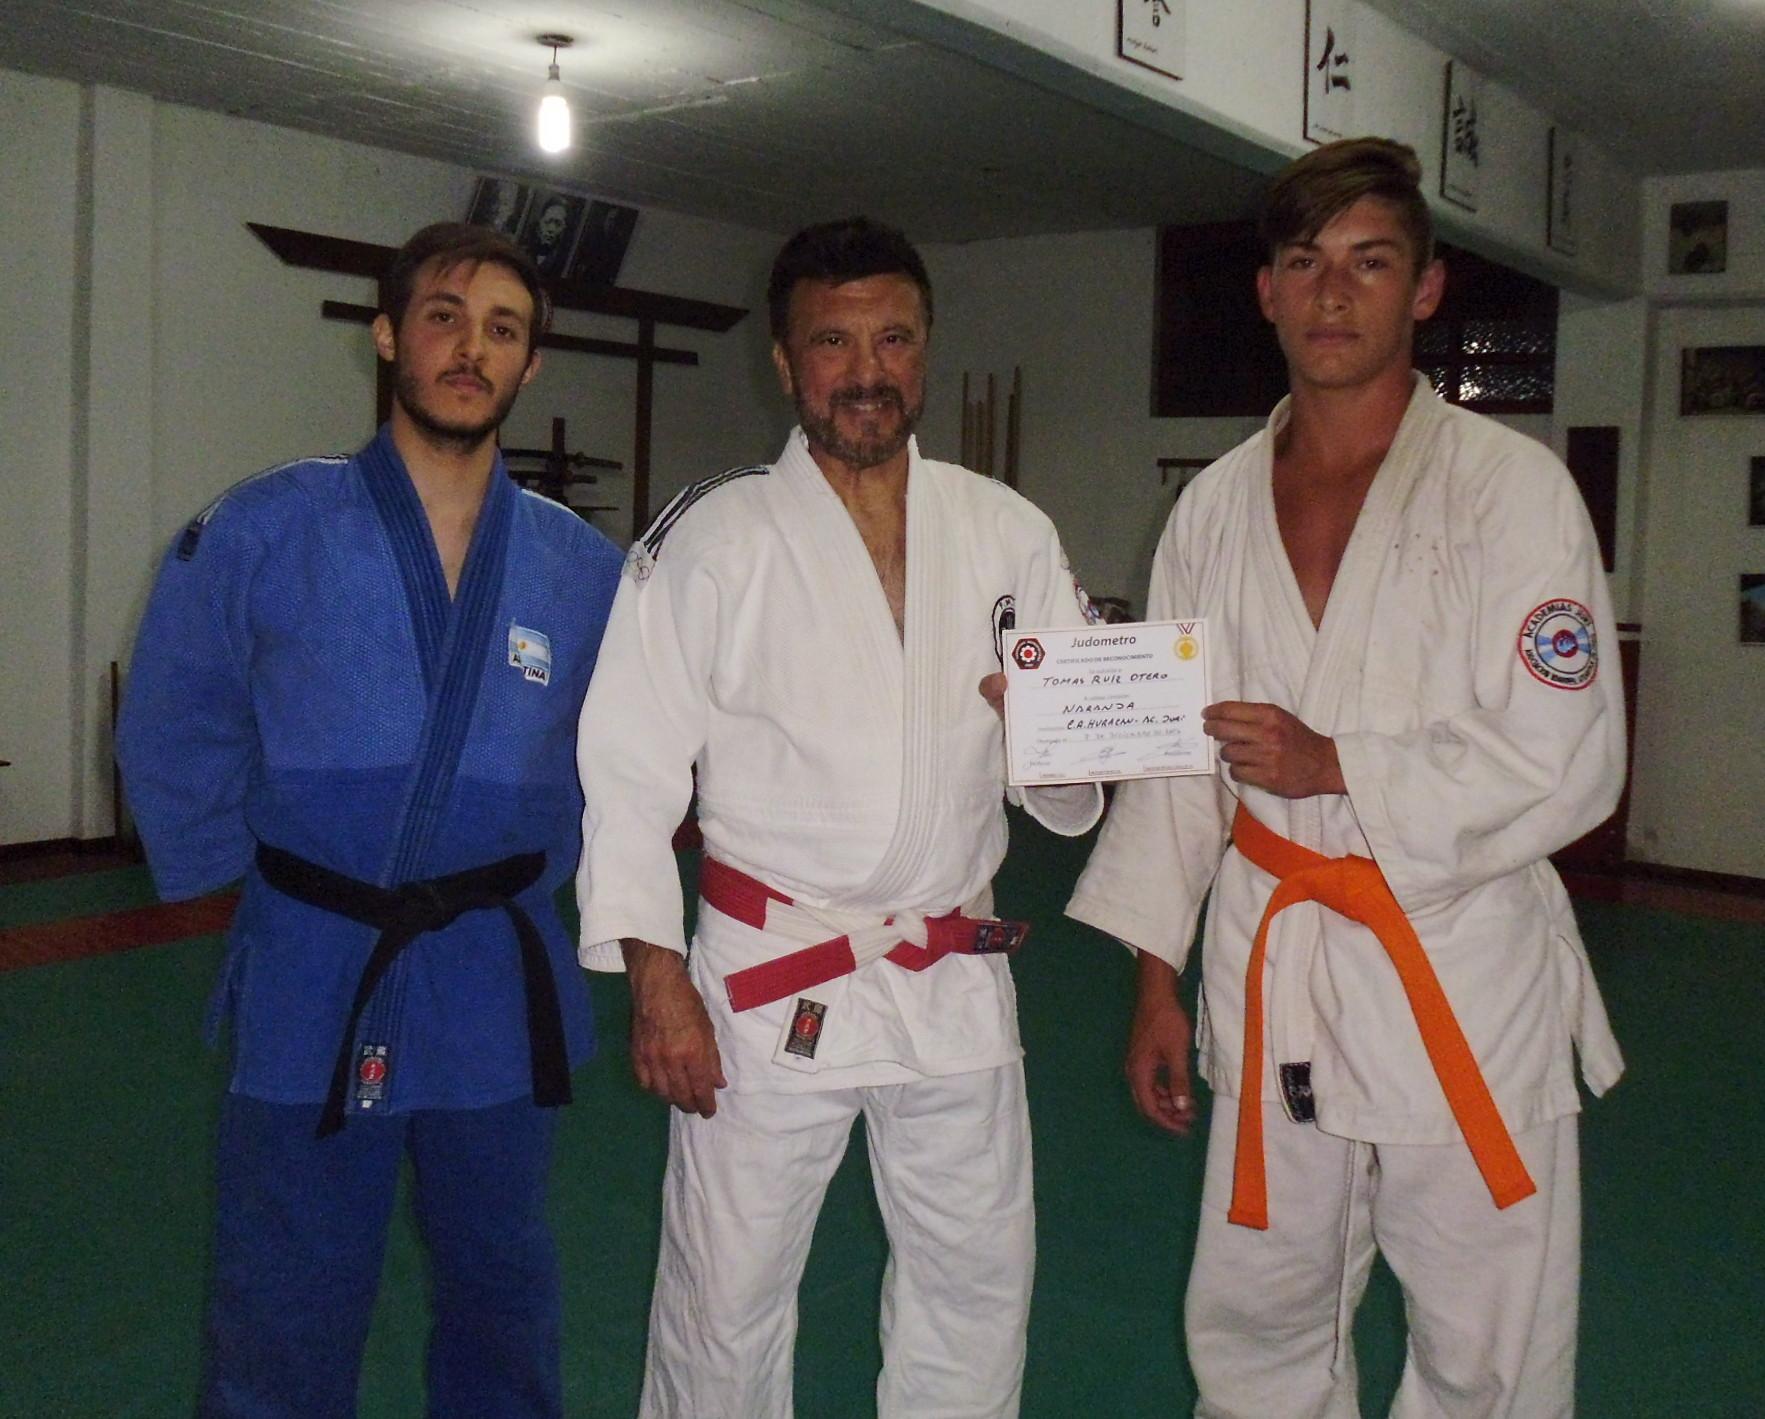 Tobias Recibe su diploma de Federaciòn Metropolitana de Judo de  7mo.Kyu (Cinturòn Naranja)